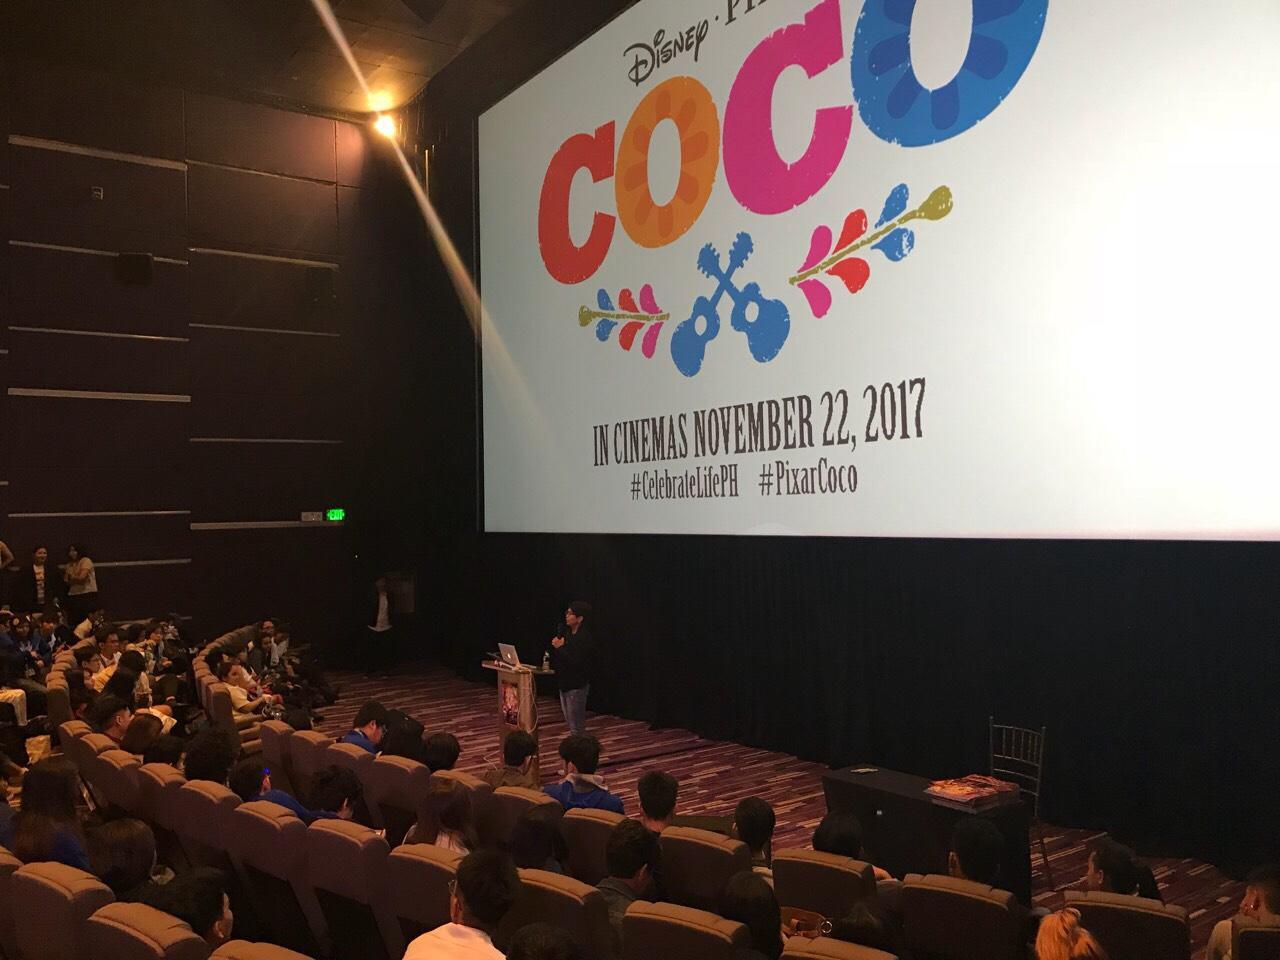 Animation Workshop with Pixar animator Gini Santos